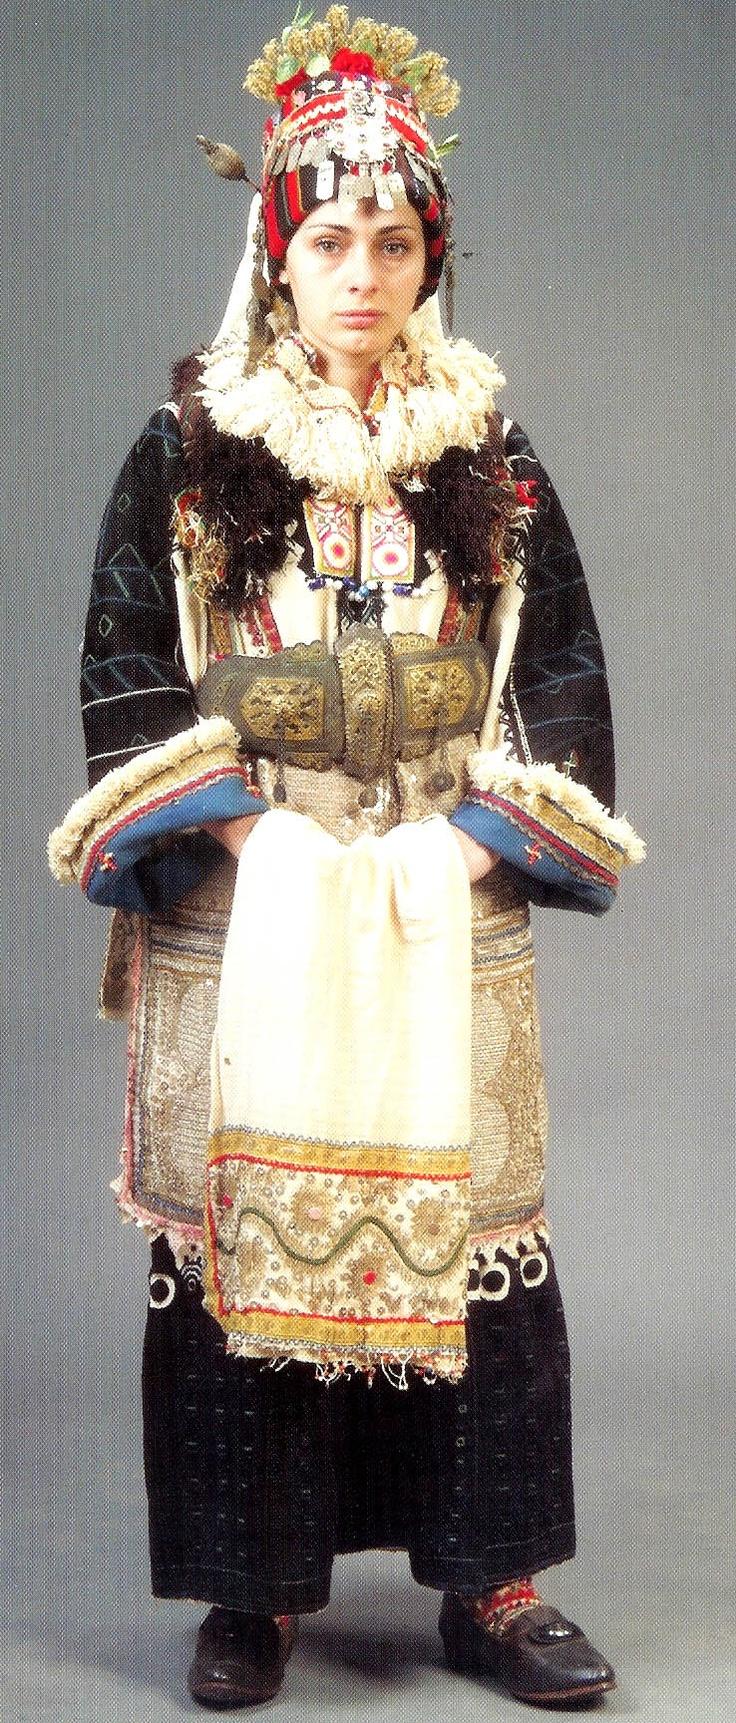 Bridal costume village Mirkovtsi Skopska Crna Gora Macedonia